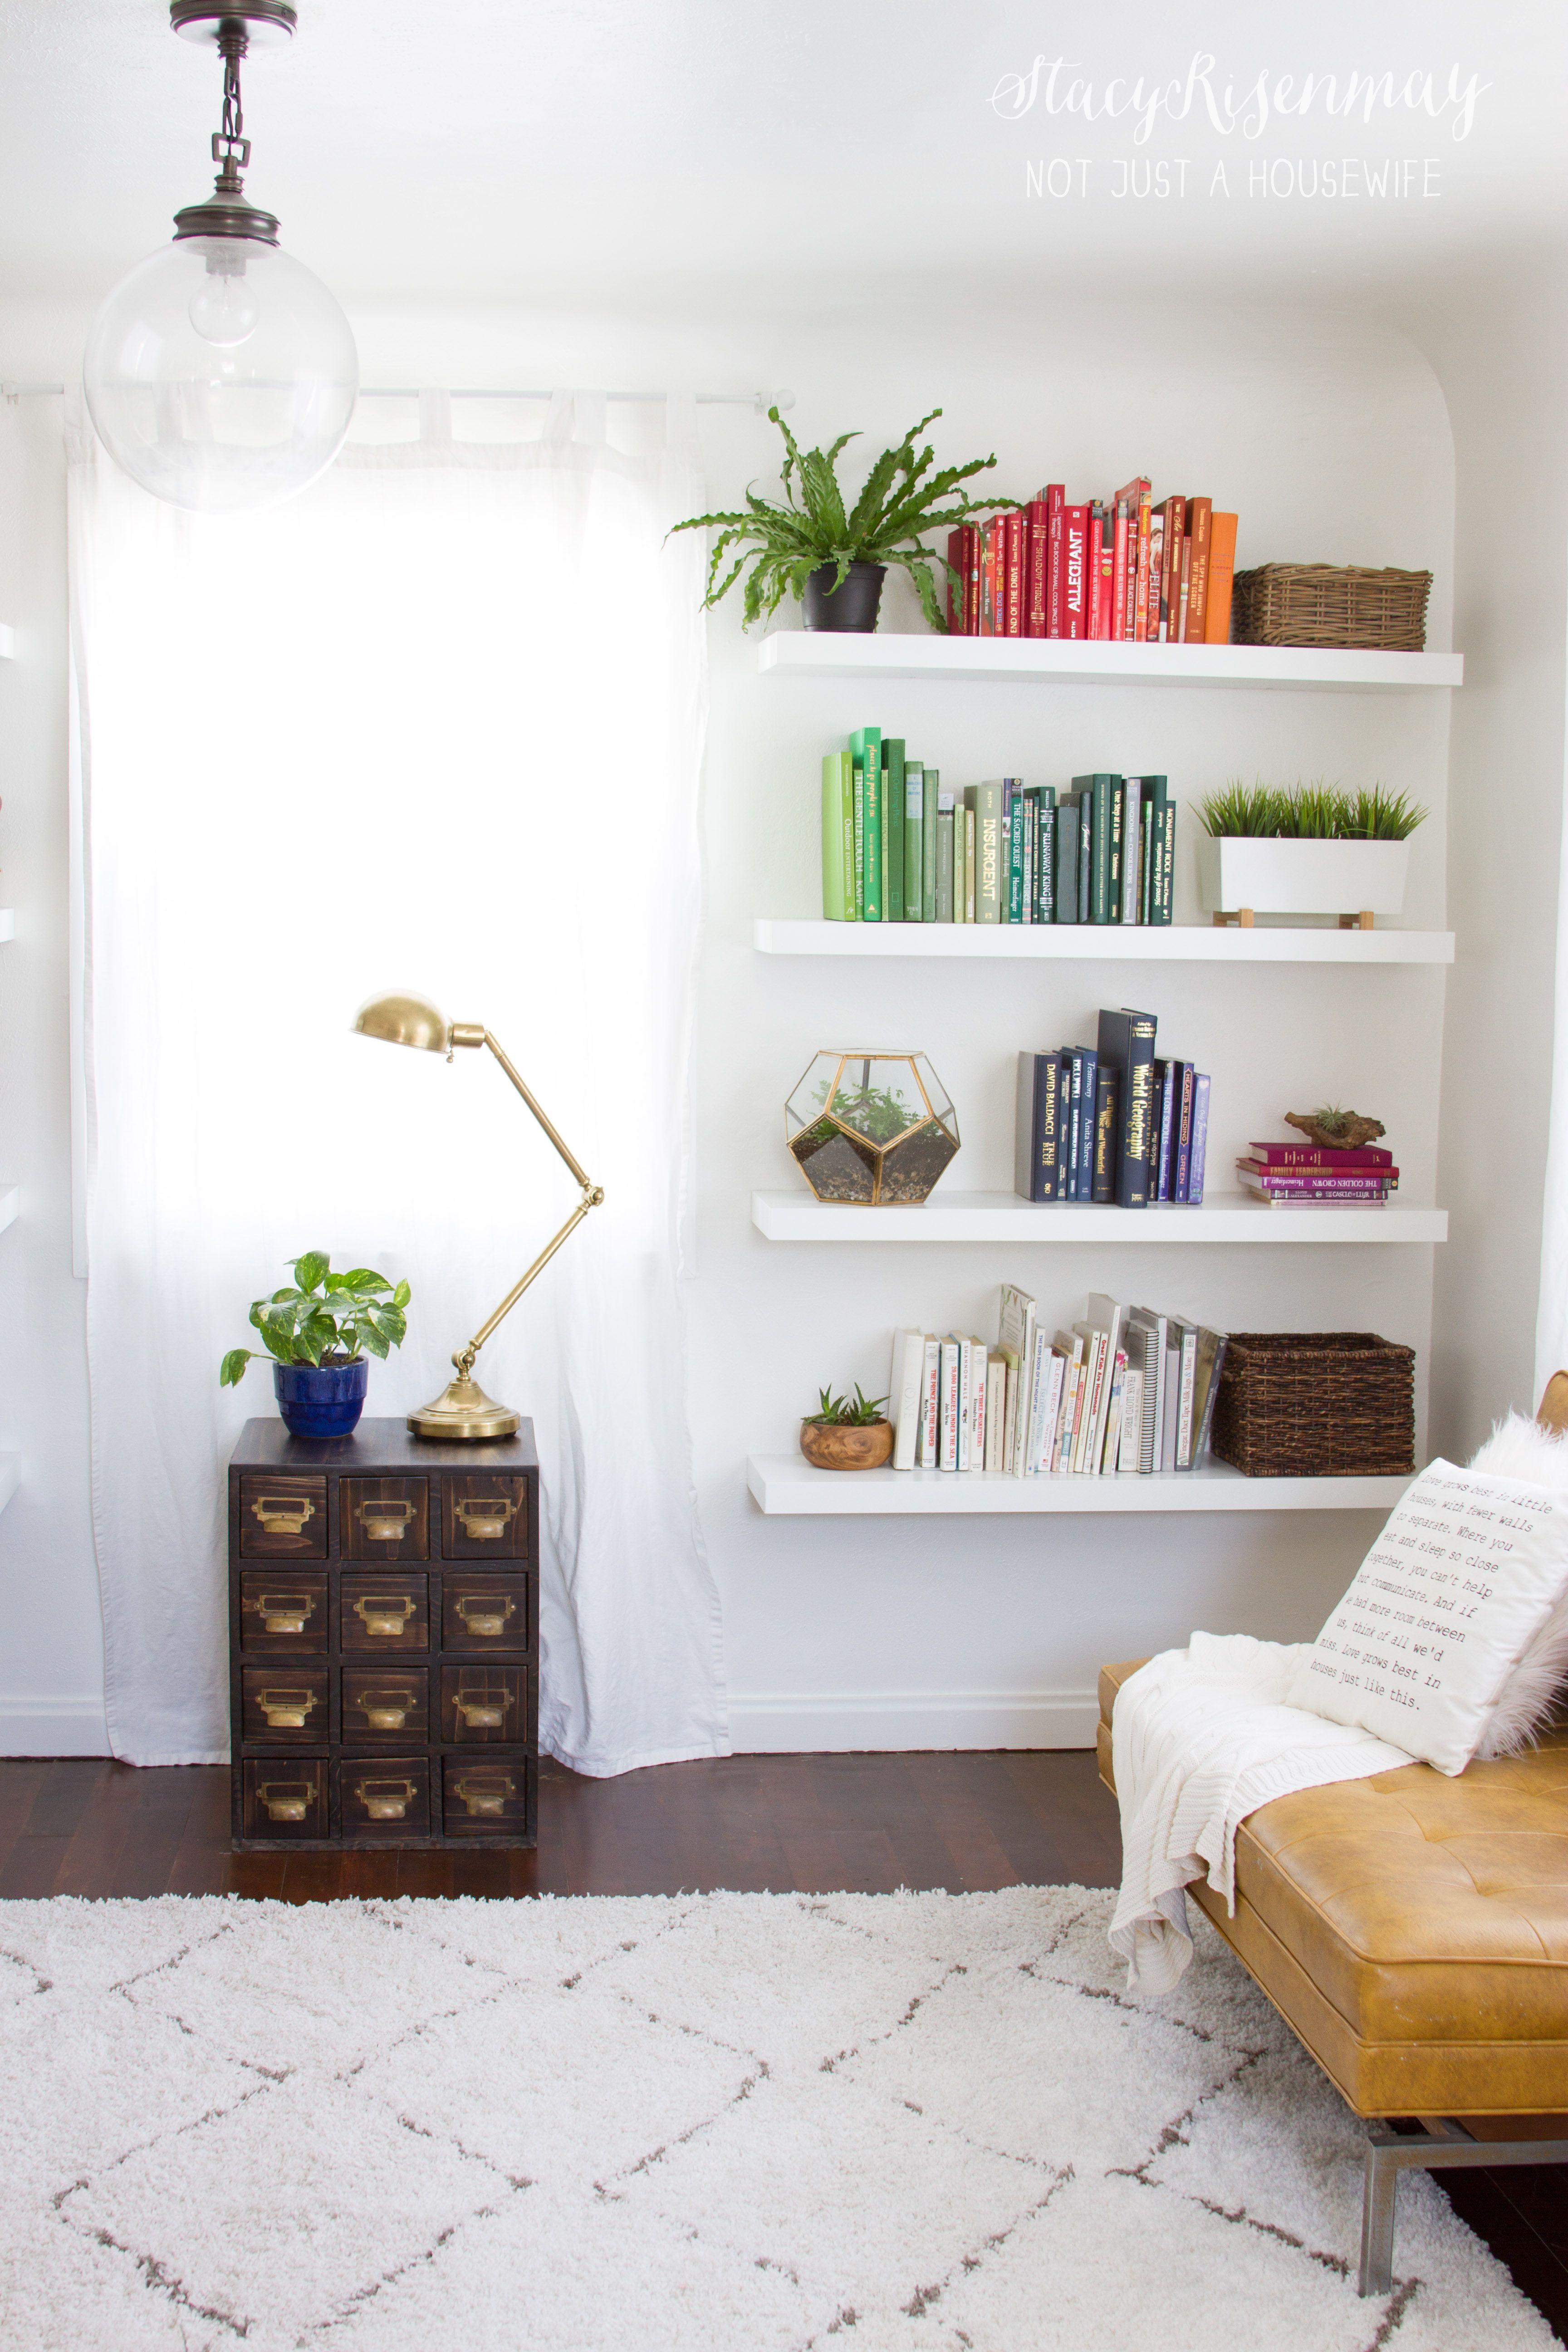 Small House Series Clutter Storage Decoraciones De Interiores Dormitorios Decoracion Estanterias Estanterias Flotantes